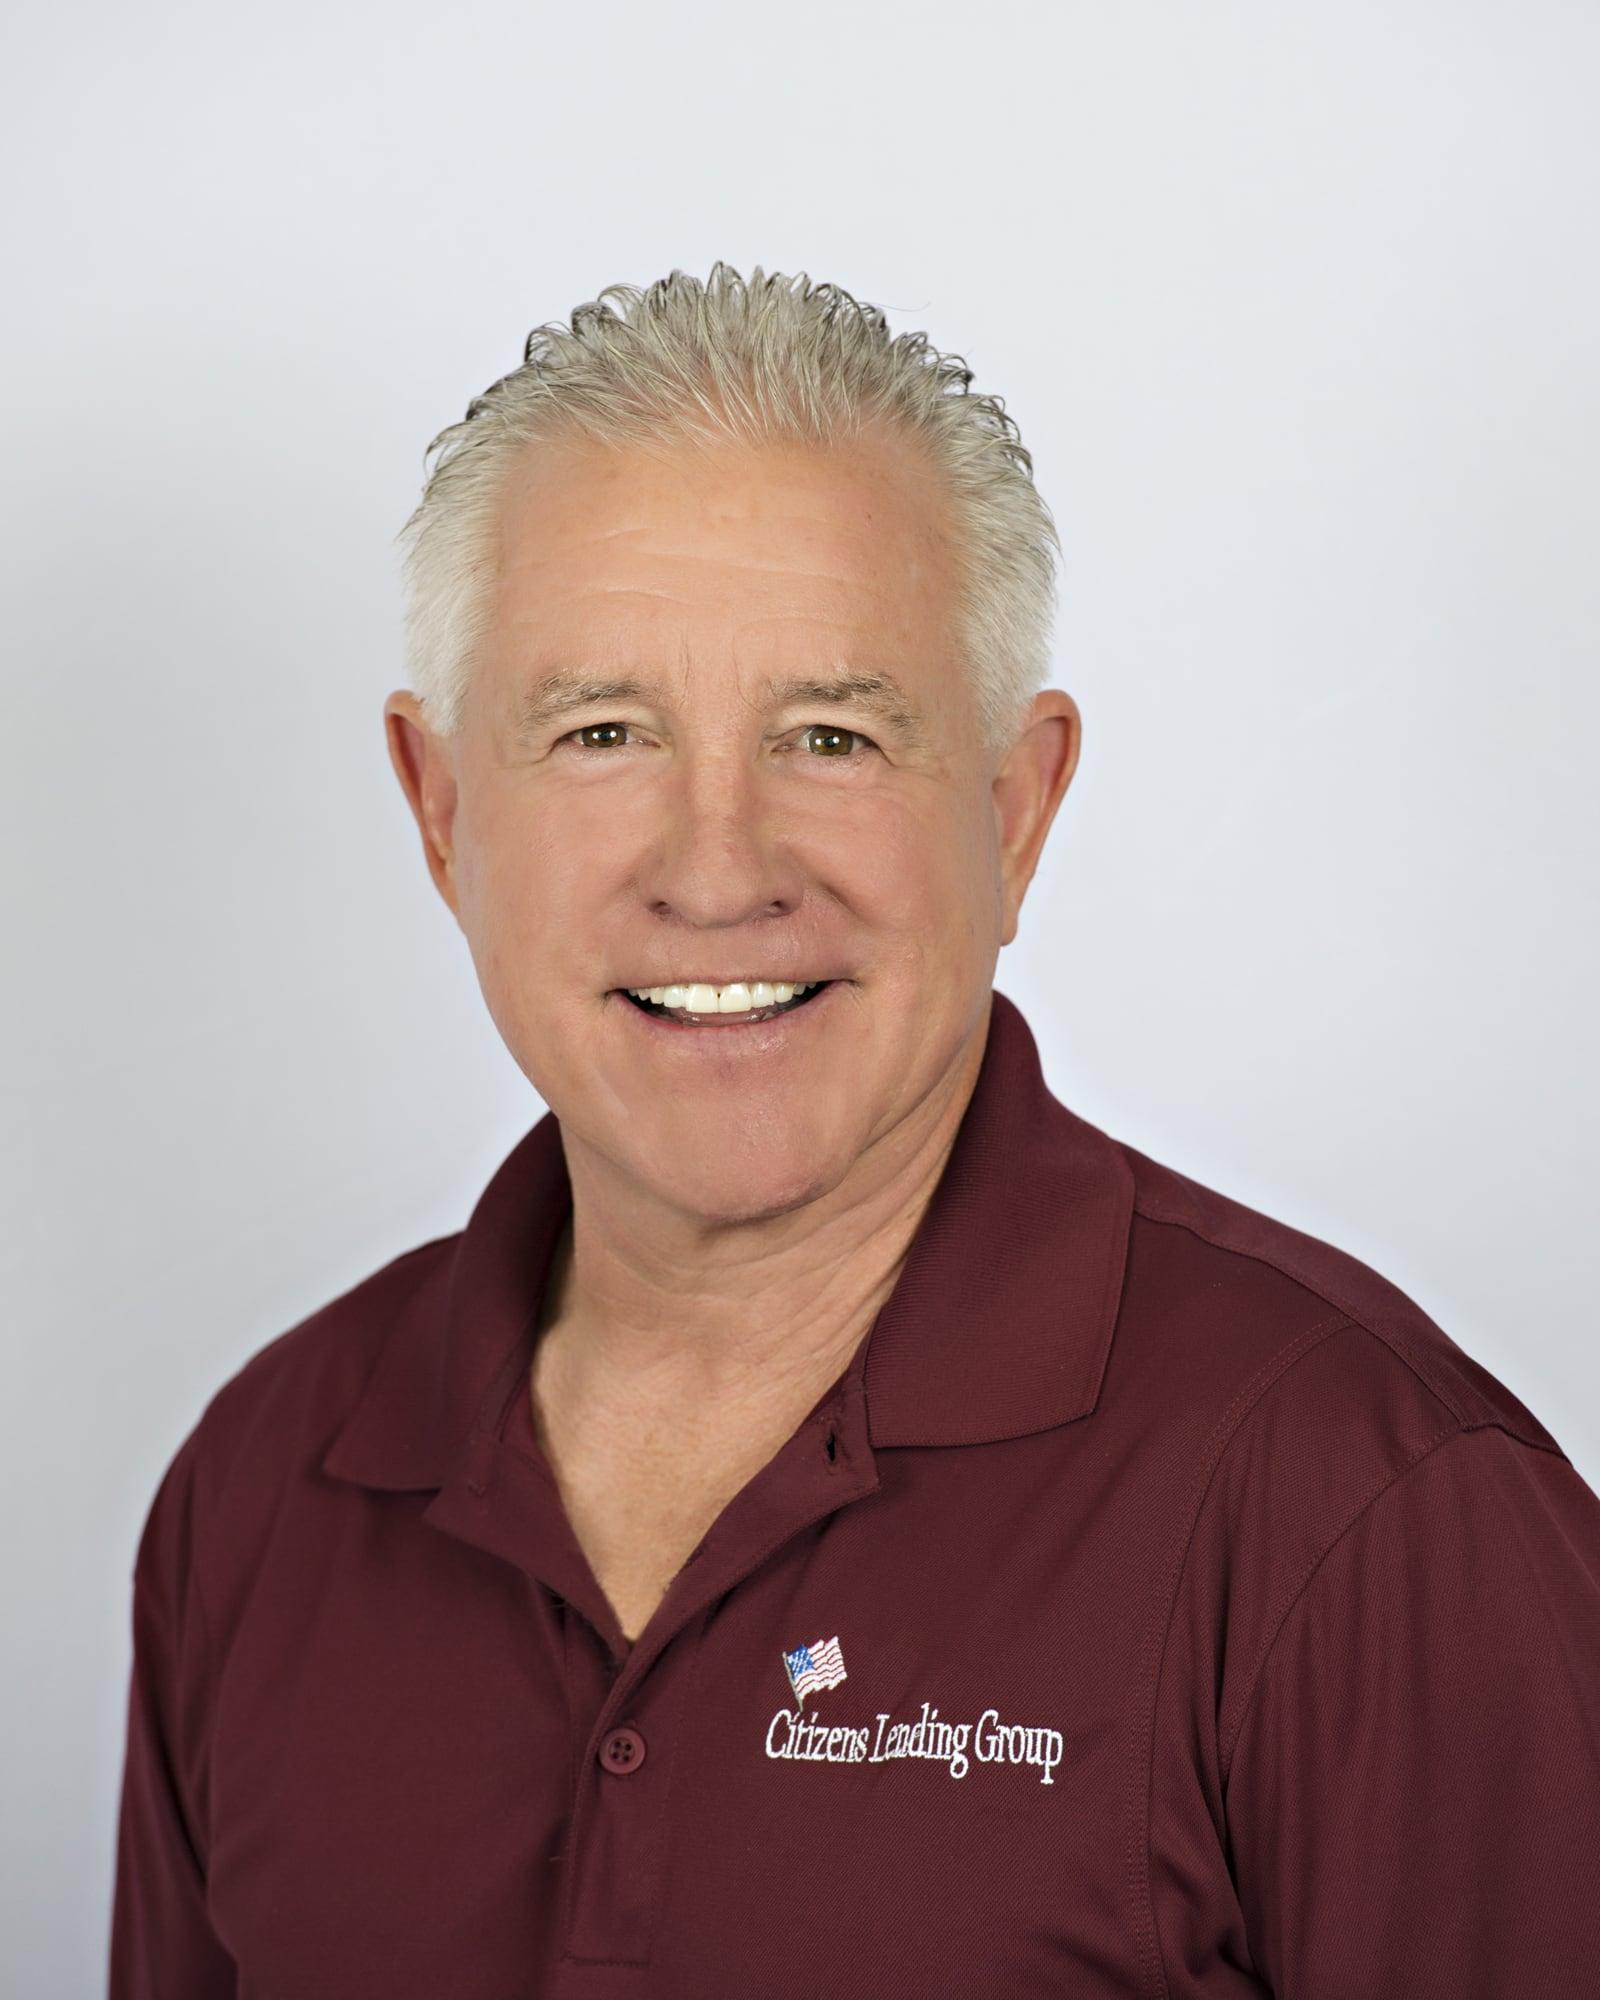 Jeff Krolosky